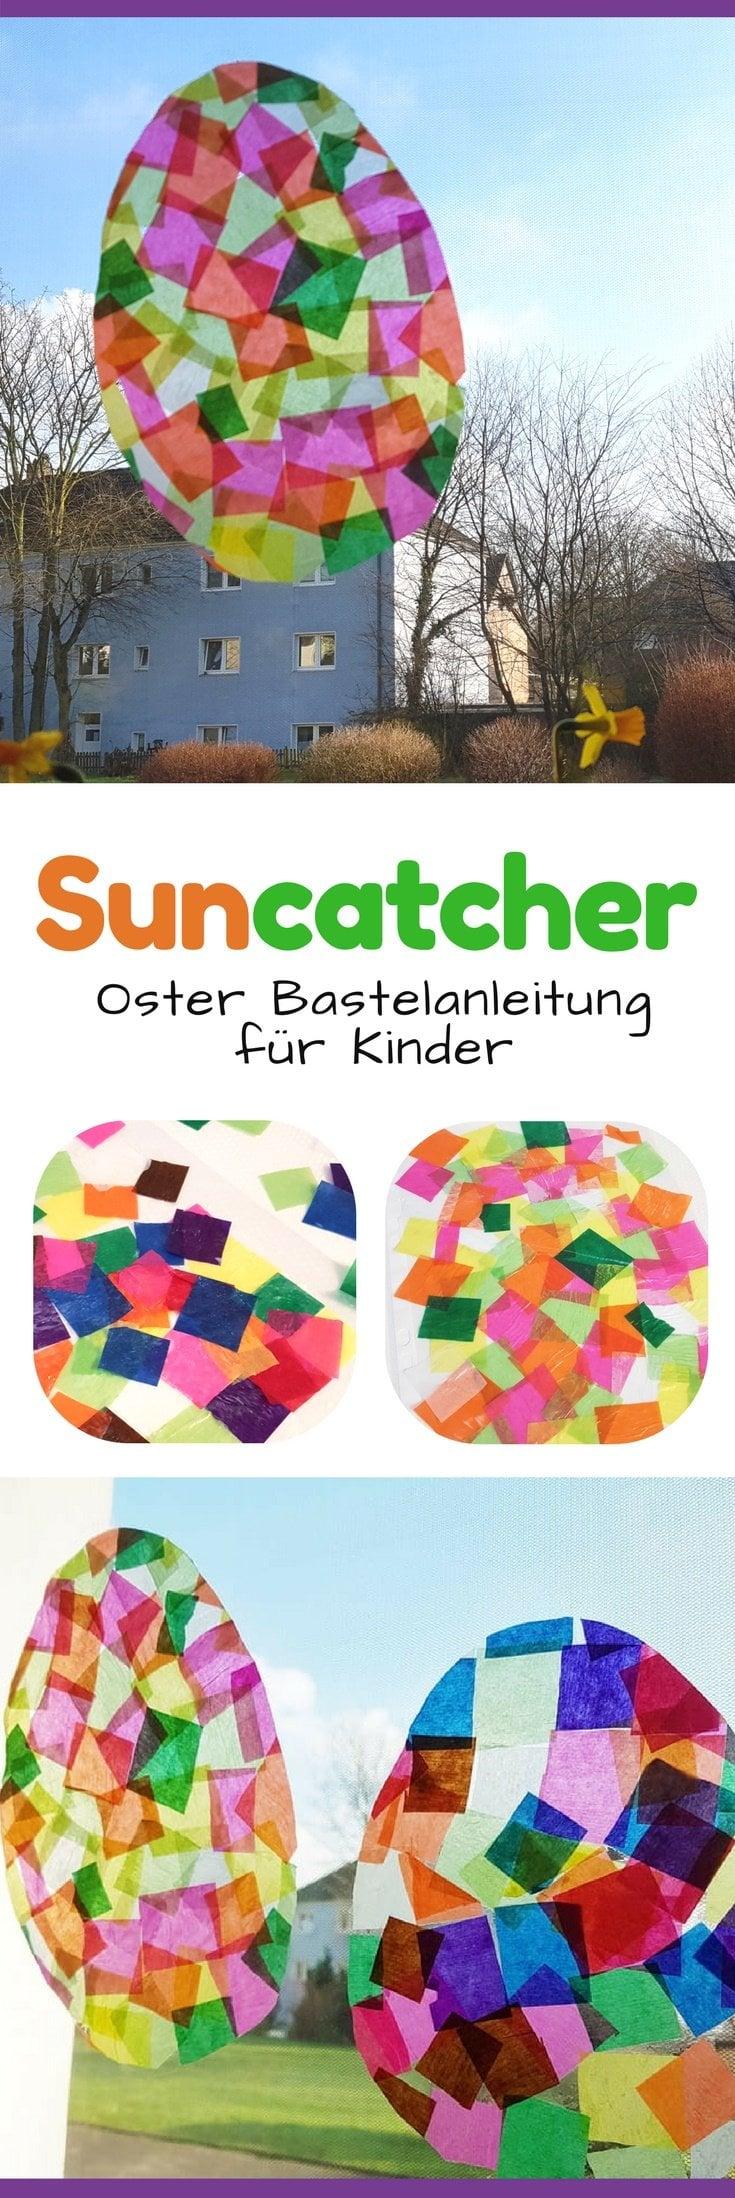 Suncatcher DIY - Frühling Fensterbild basteln